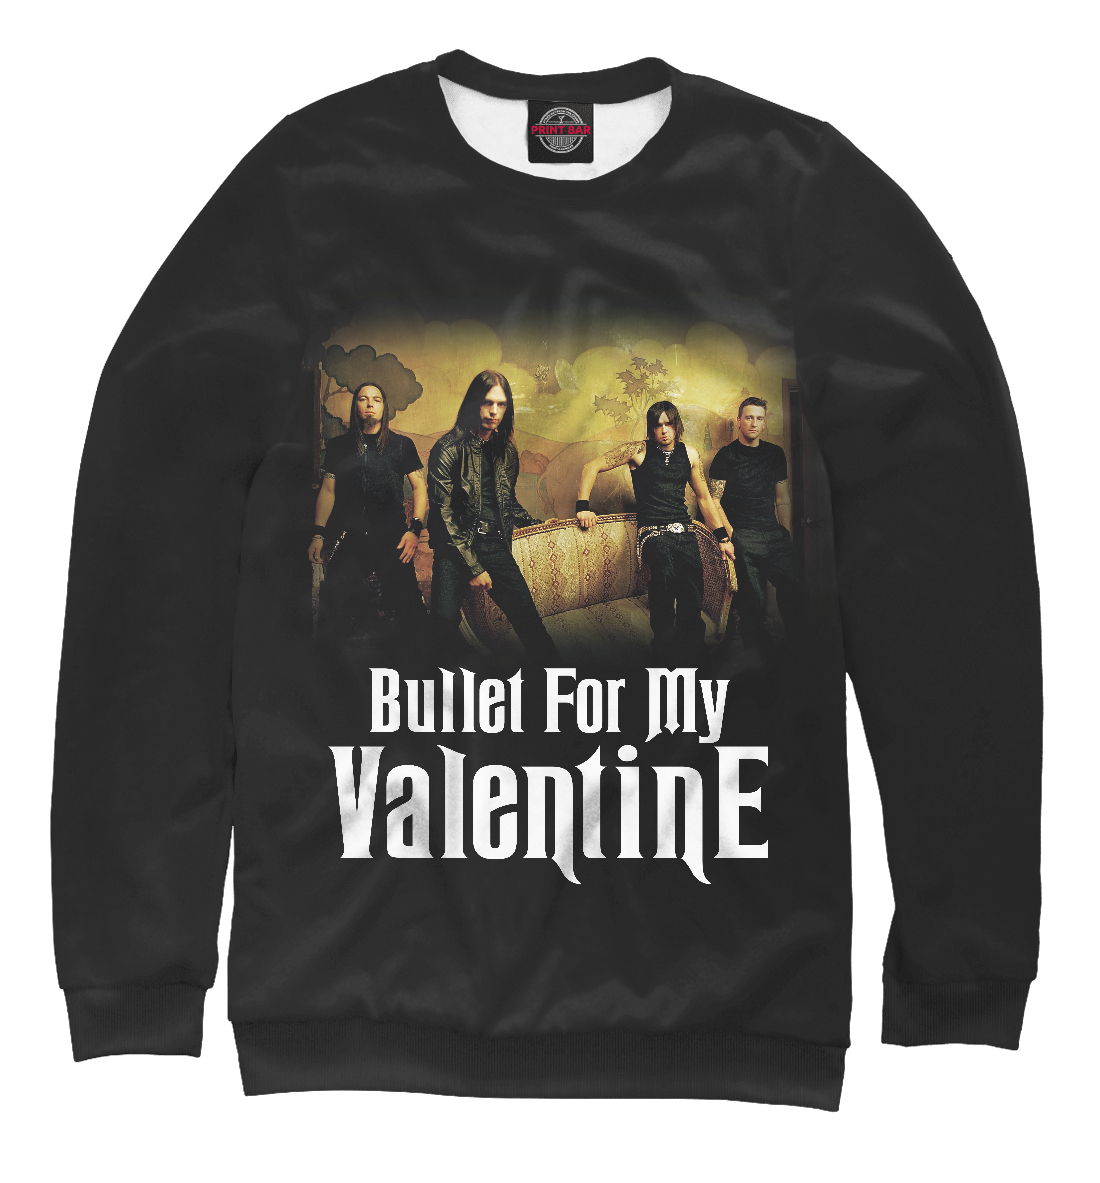 Bullet for My Valentine, Printbar, Свитшоты, BMV-531779-swi-1  - купить со скидкой